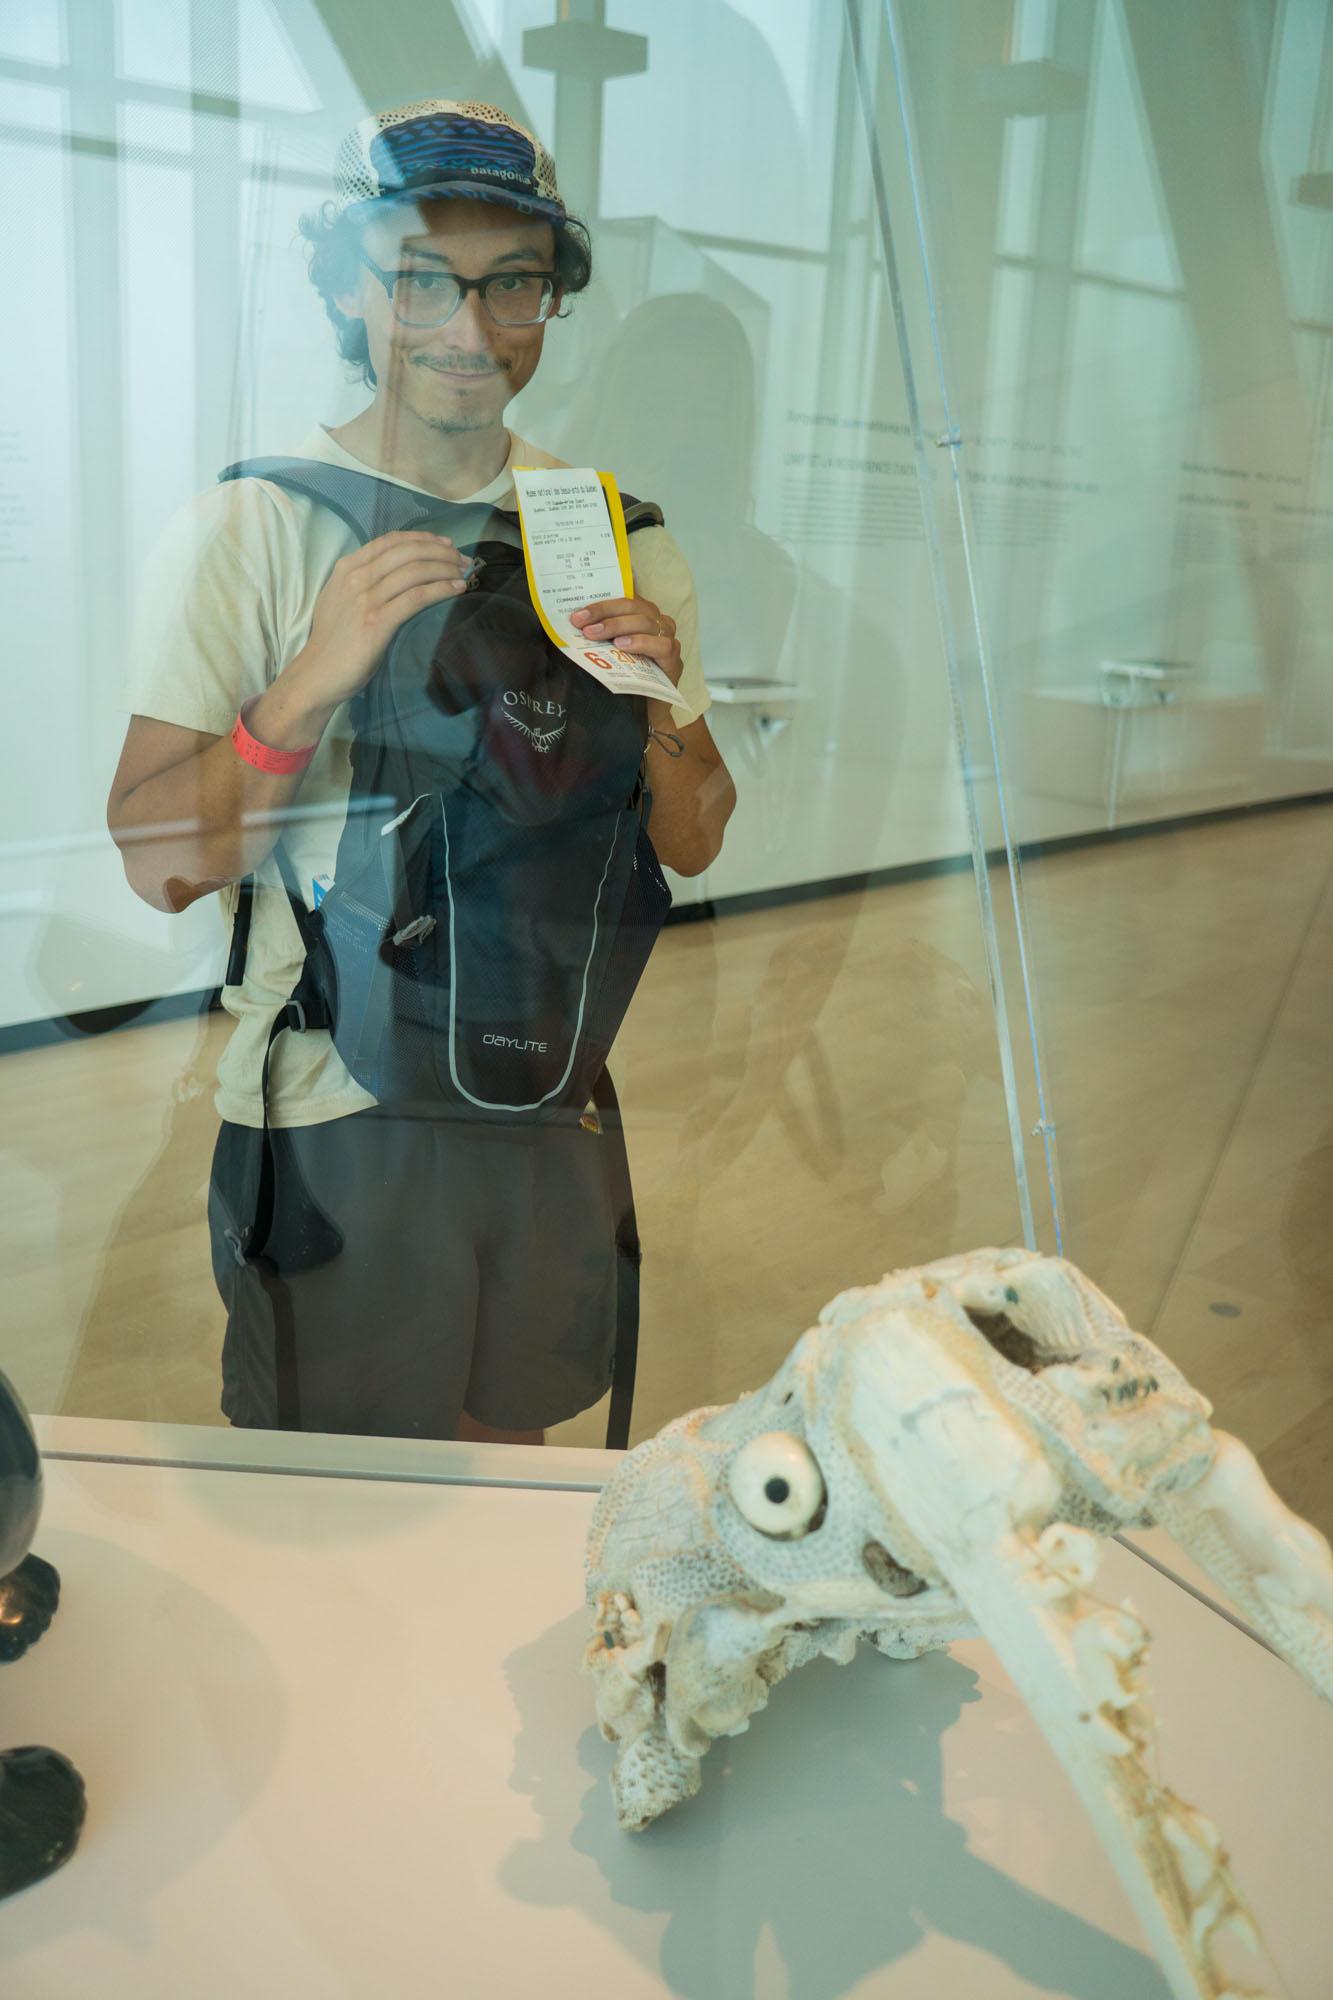 Owen enjoying the art in the Musée national des beaux-arts du Québec